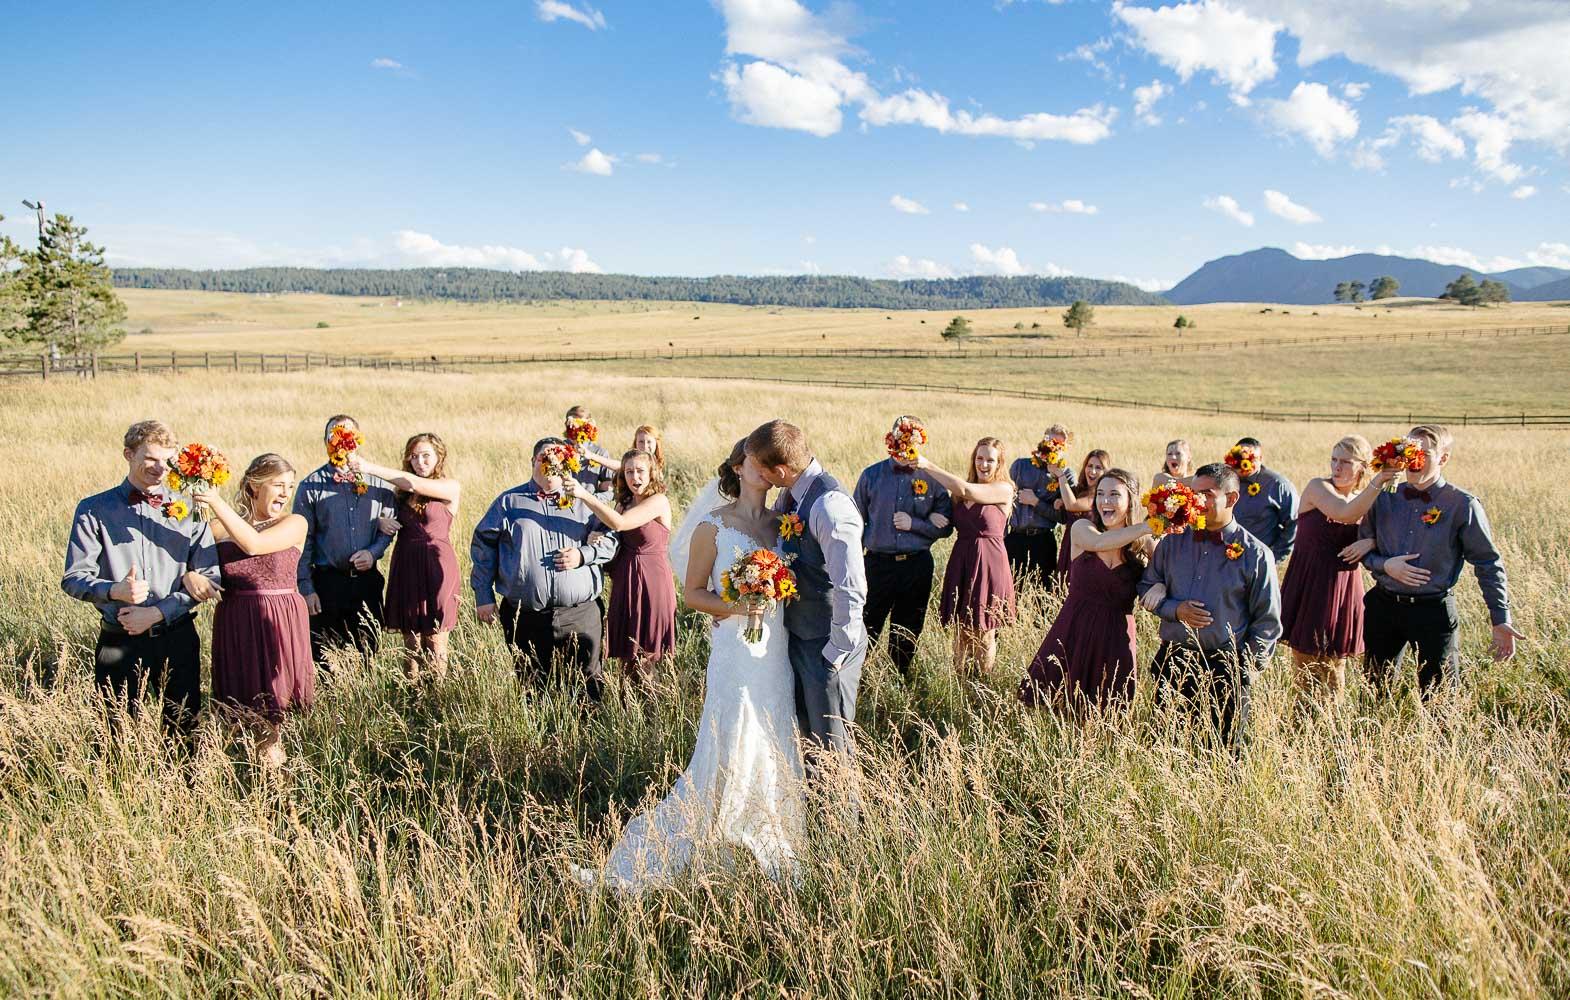 160902-Luxium-Weddings-Arizona-Michael-Becca-Spruce-Mountain-Ranch-Colorado-webres-071.jpg